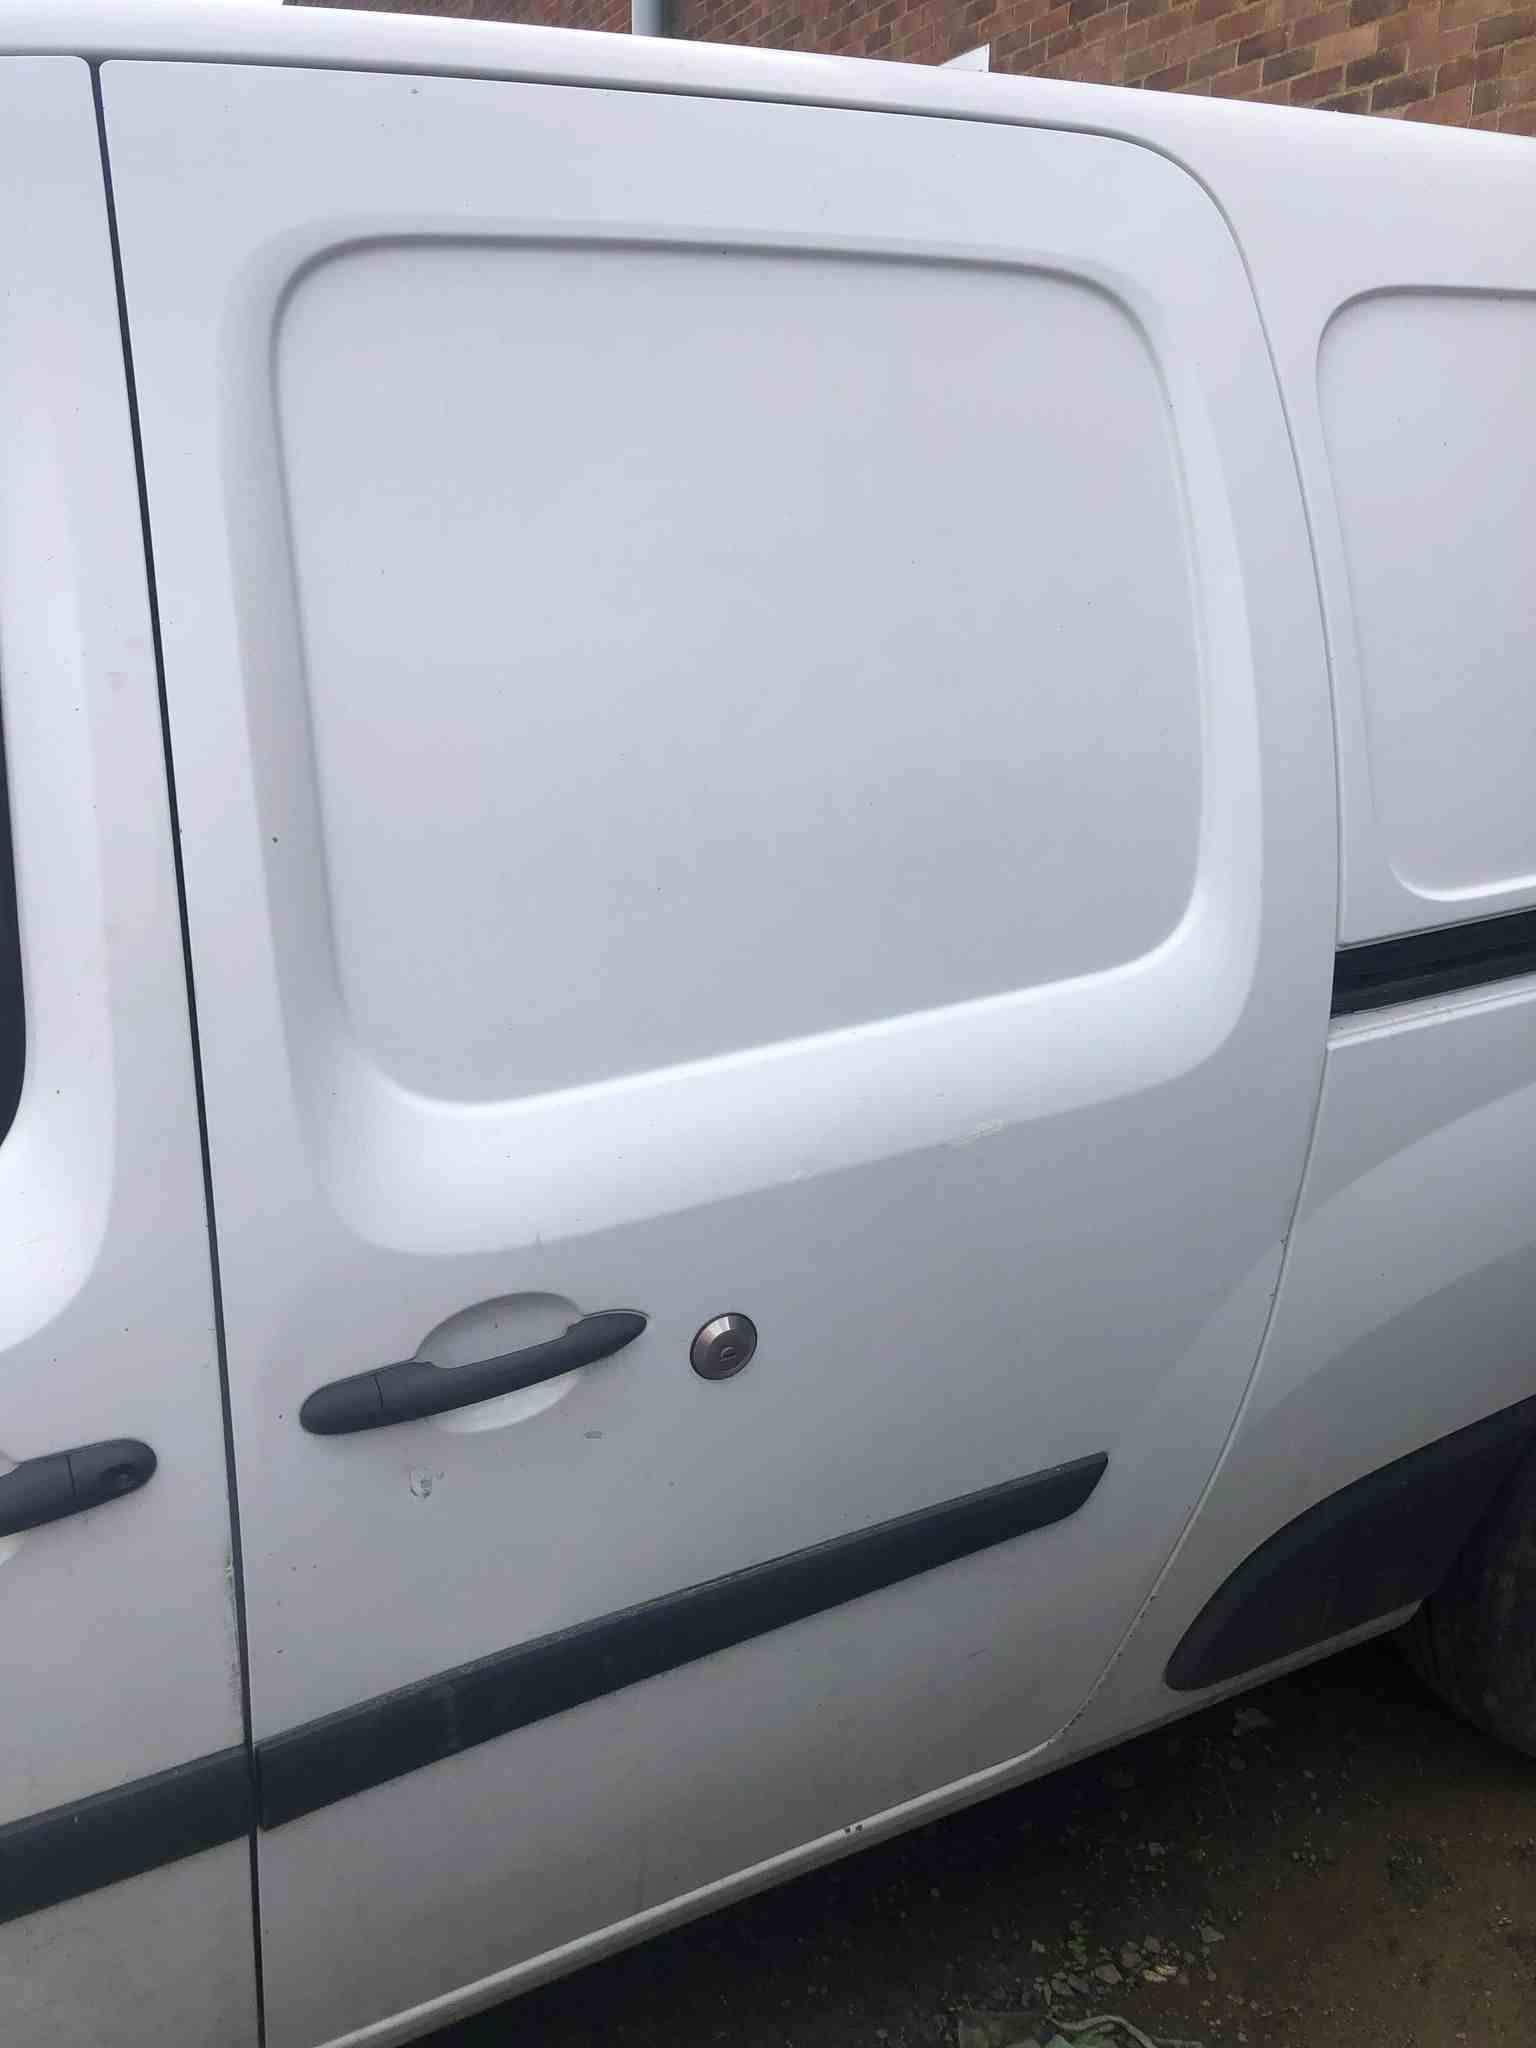 Renault Kangoo Maxi 2007-2017 Passenger NS Sliding Door White OV389